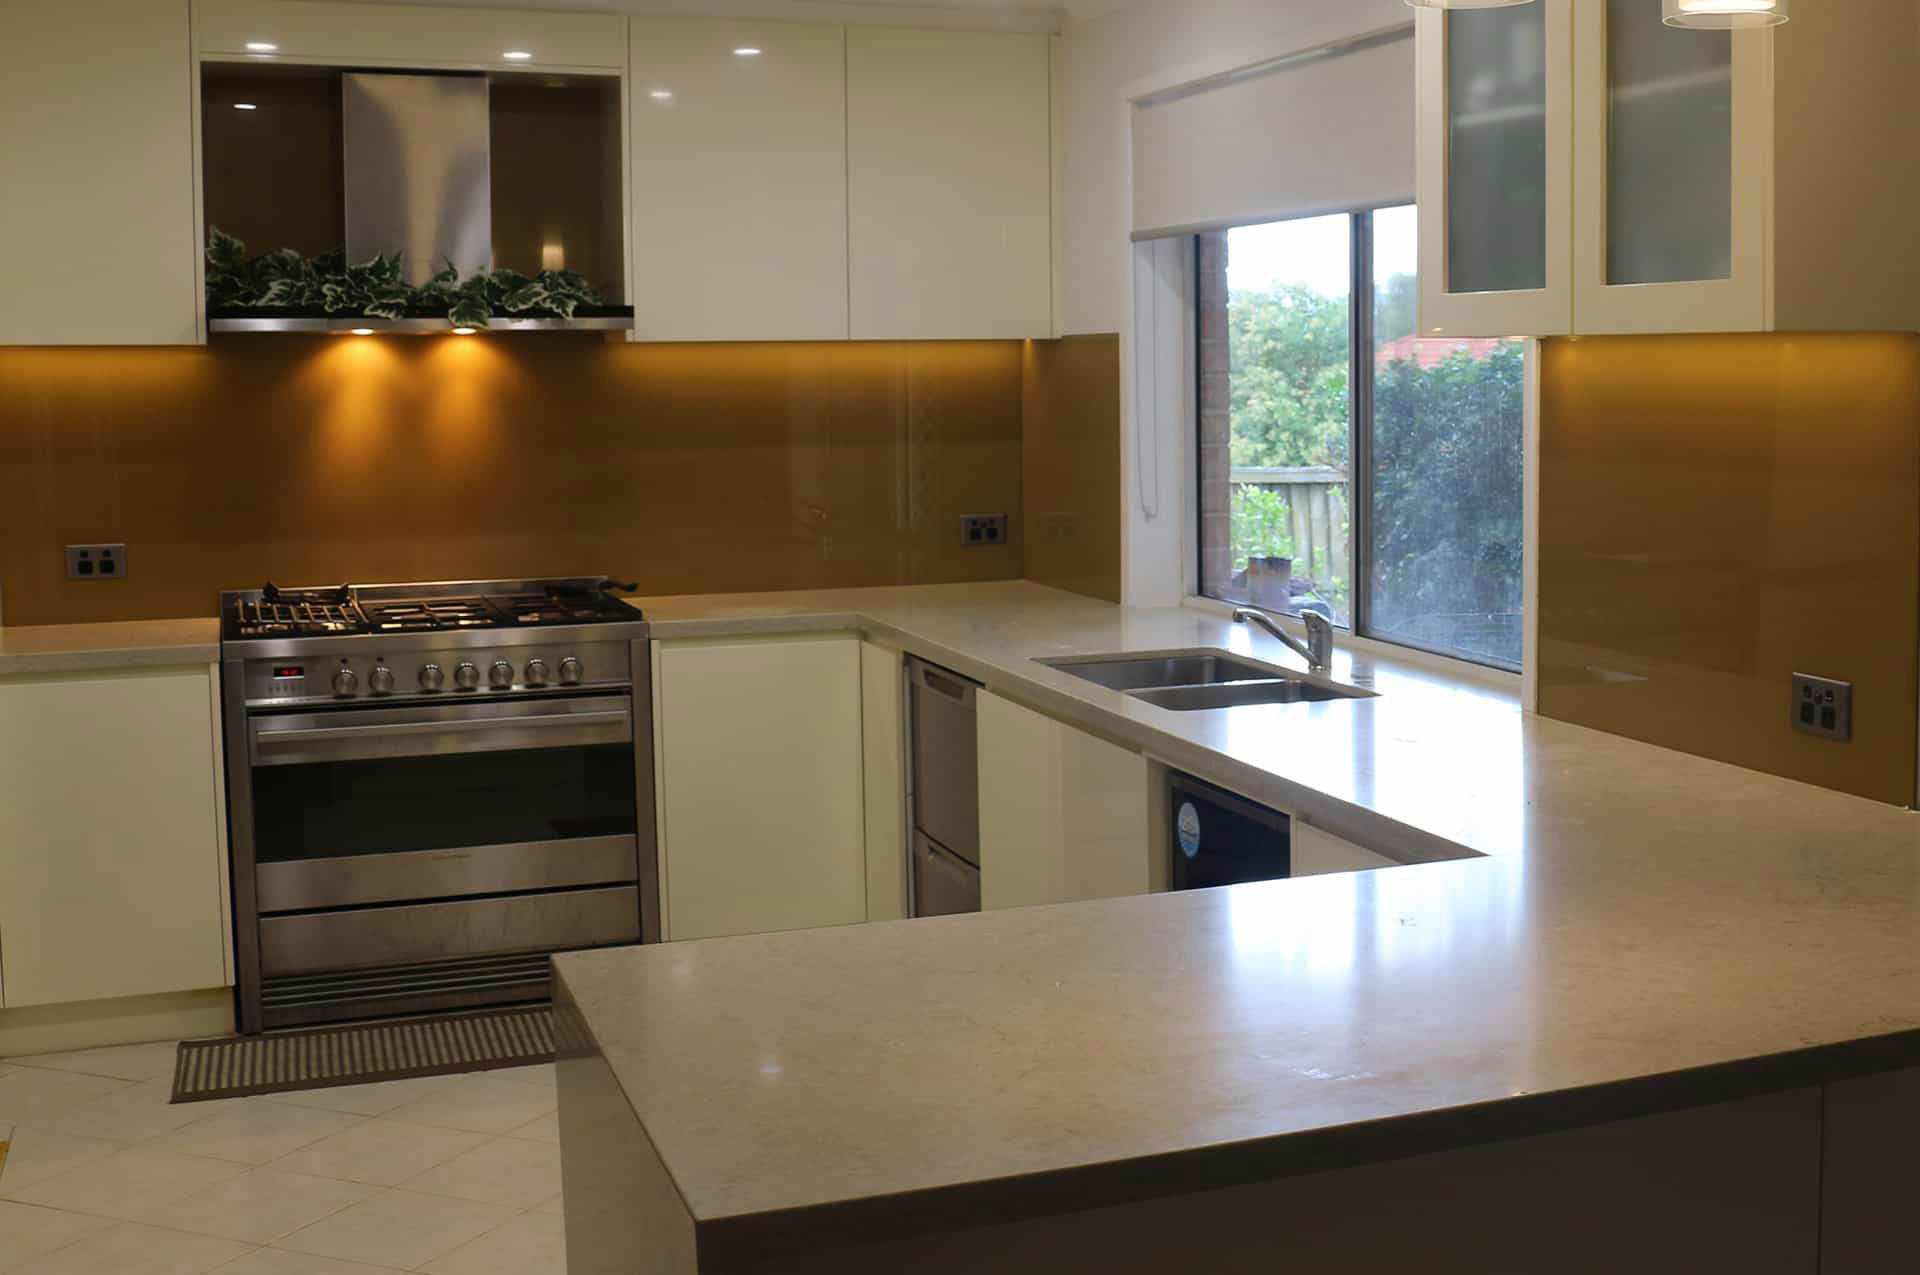 cabinets-design